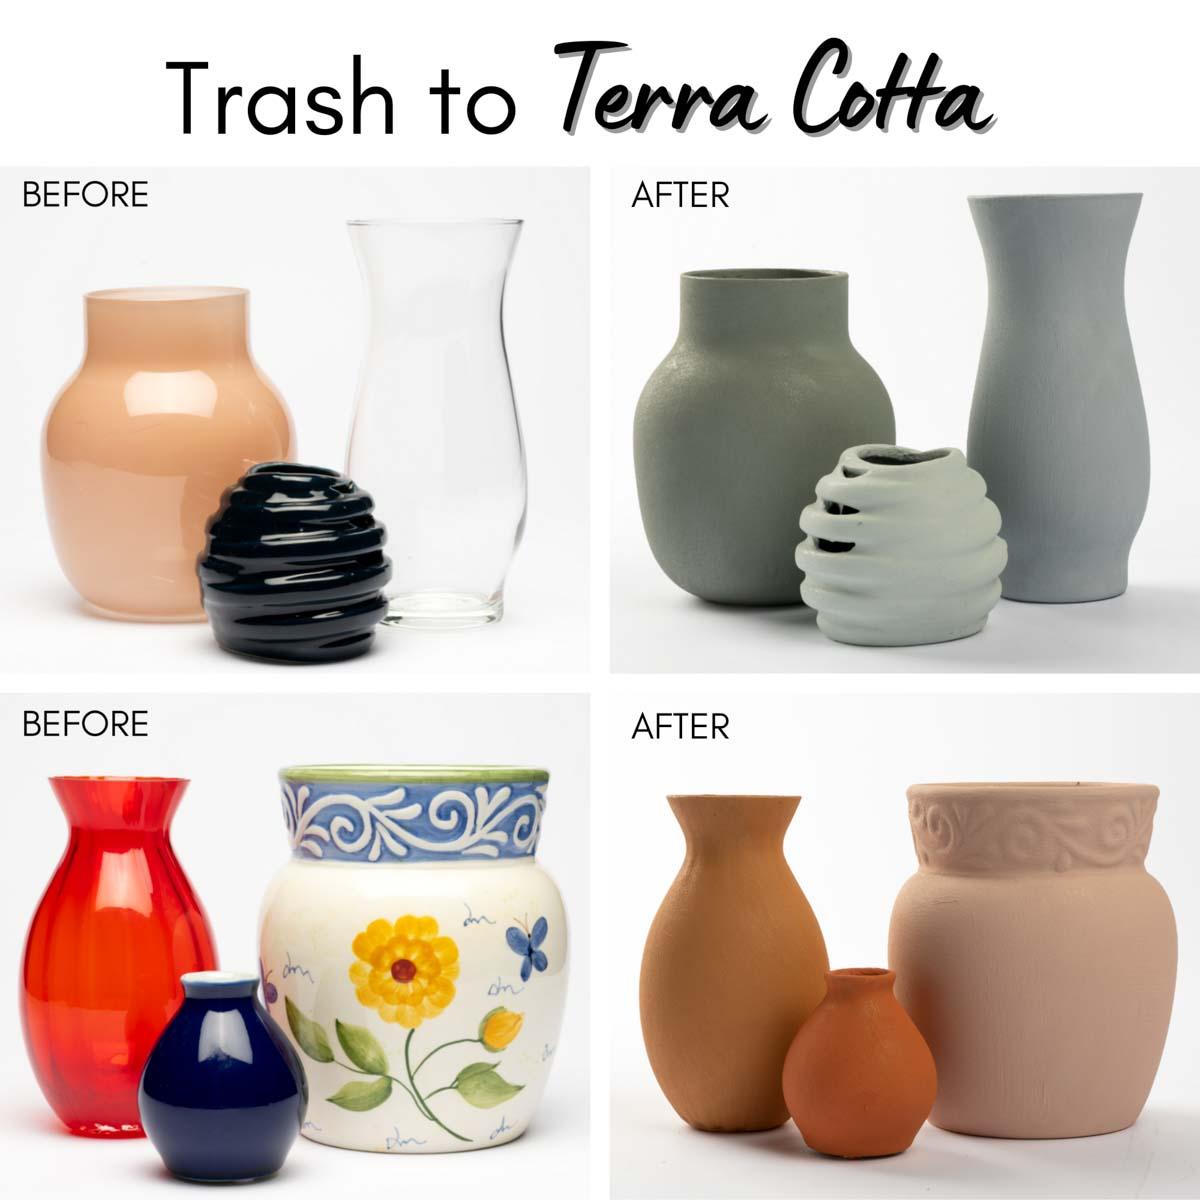 FolkArt ® Terra Cotta™ Acrylic Paint - Cool Concrete, 2 oz. - 7028